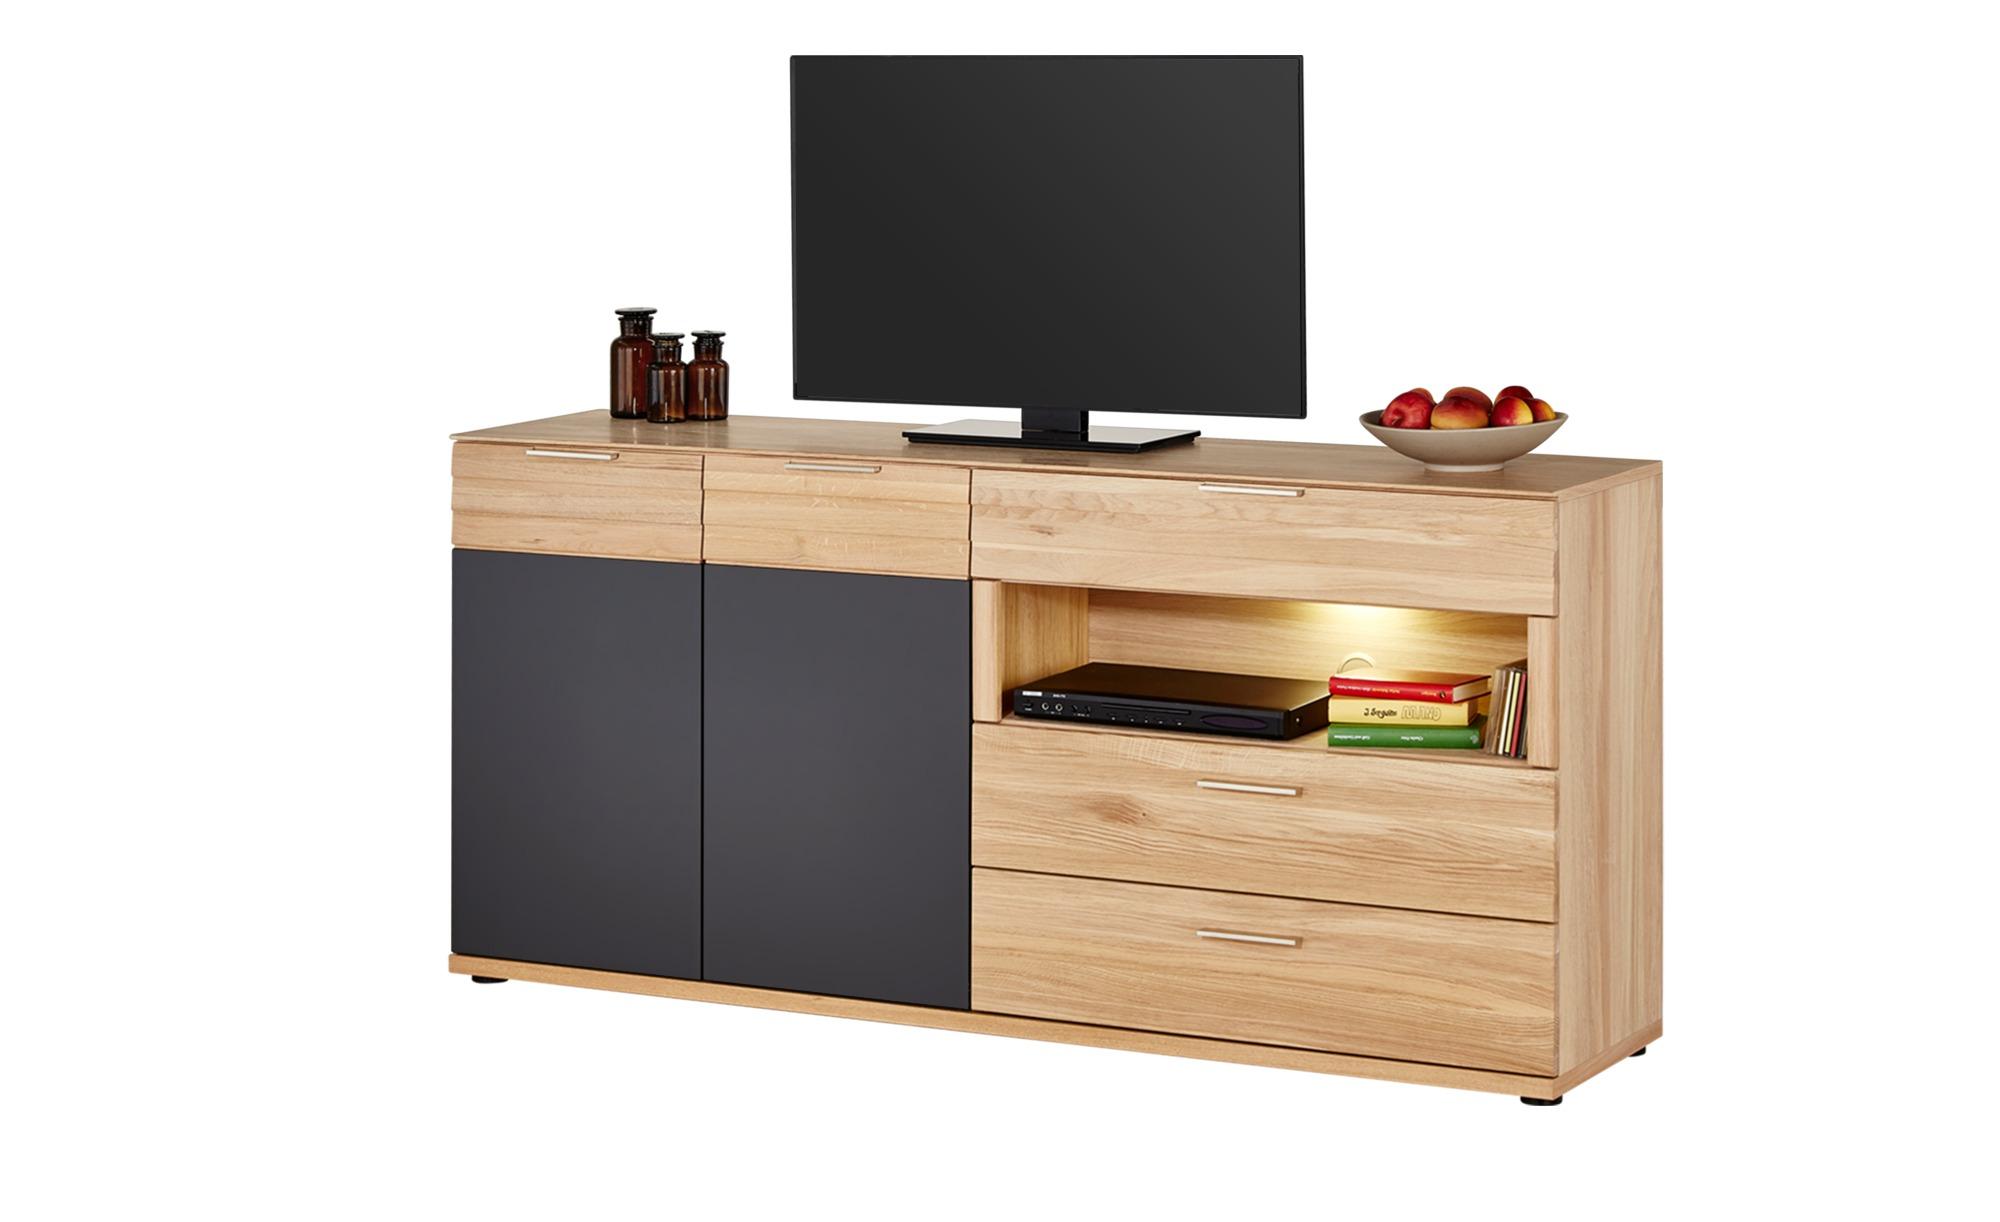 woodford sideboard achat breite 180 cm h he 87 cm. Black Bedroom Furniture Sets. Home Design Ideas